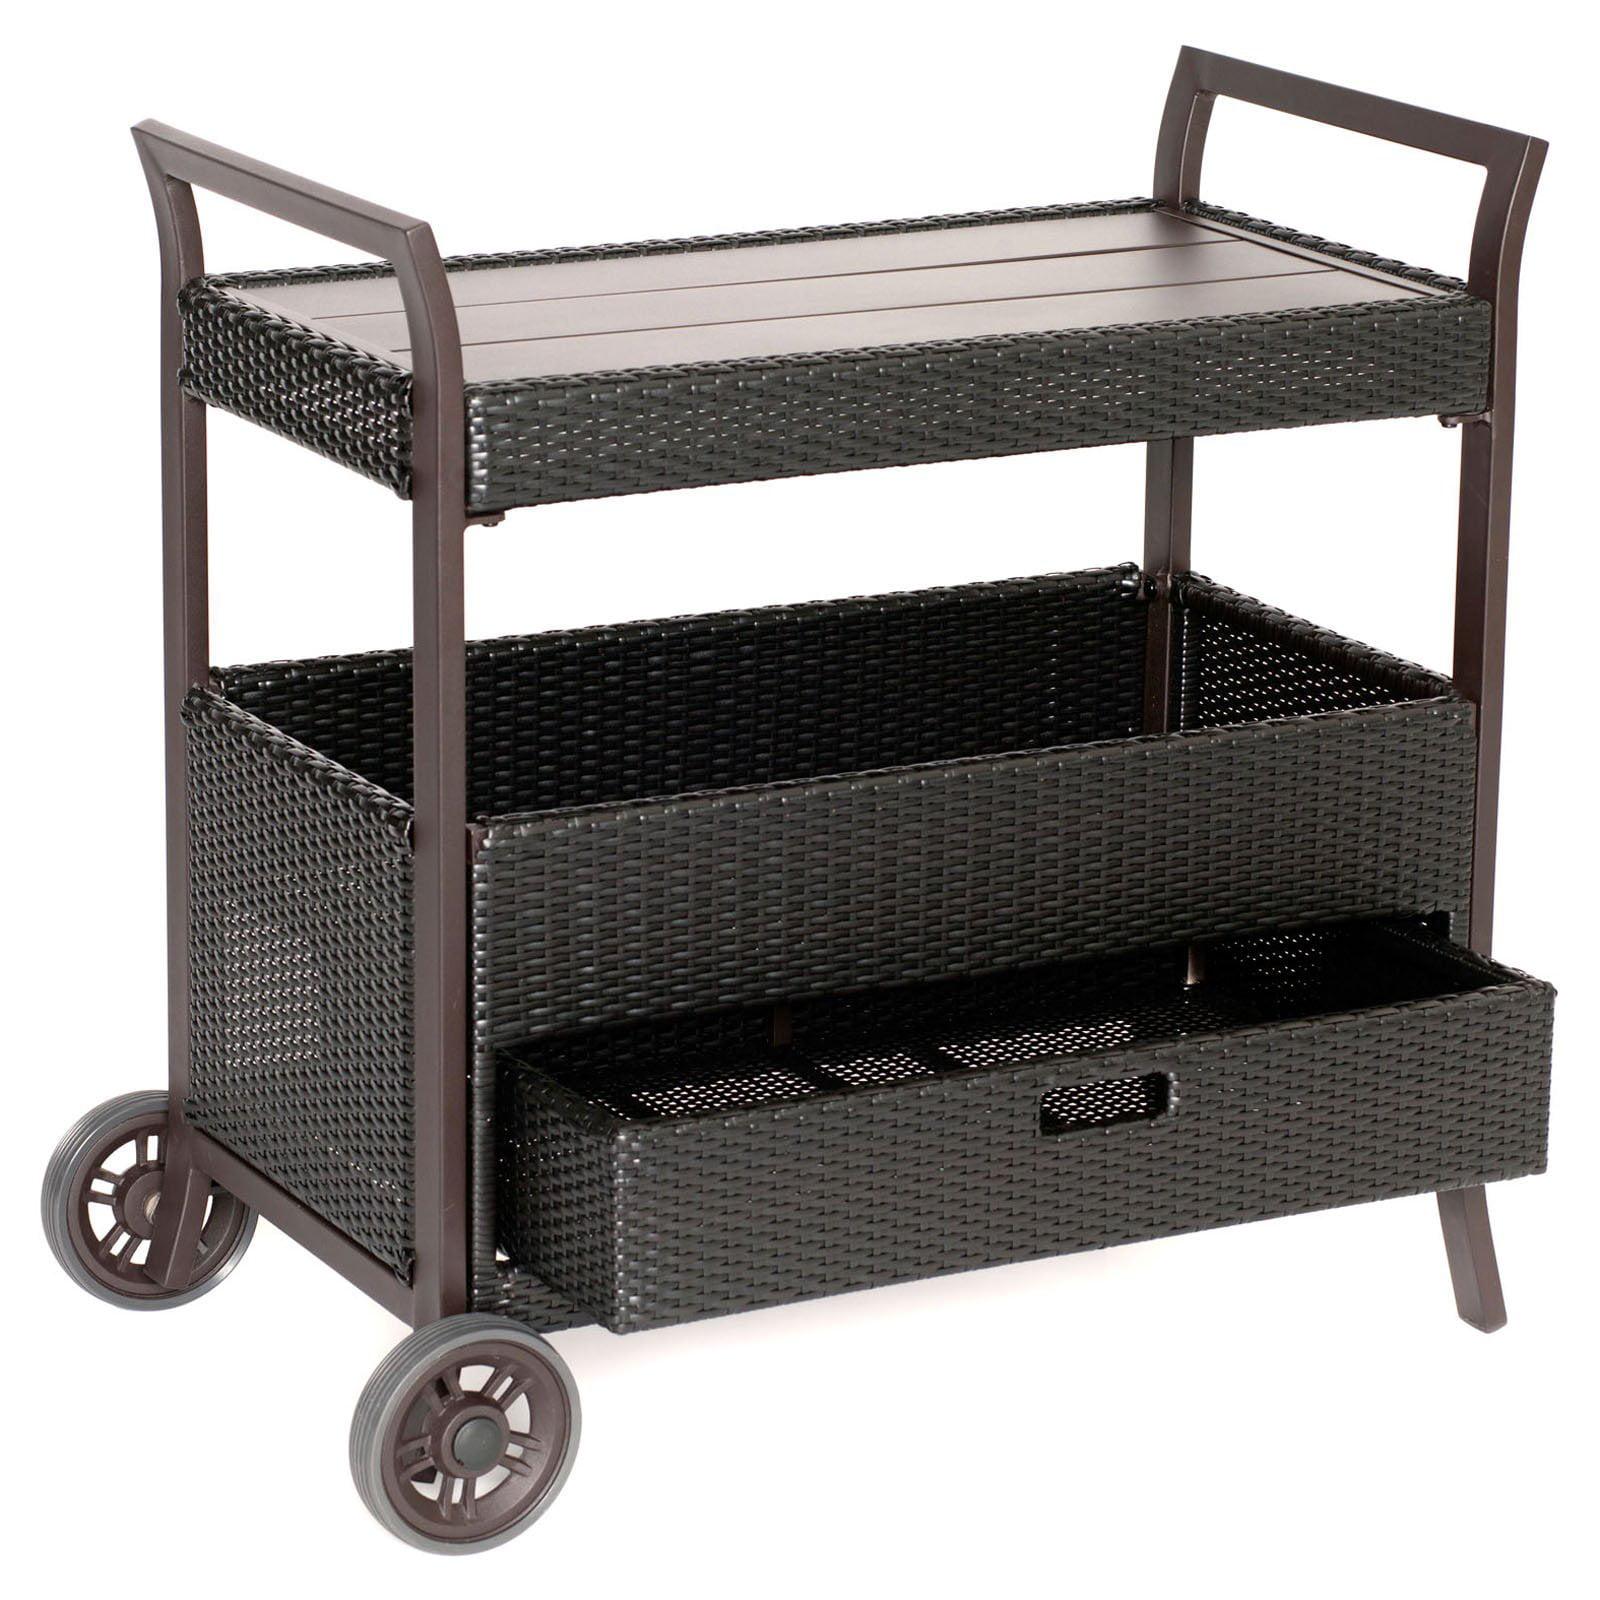 Hanover Outdoor Outdoor Bar Cart   Walmart.com